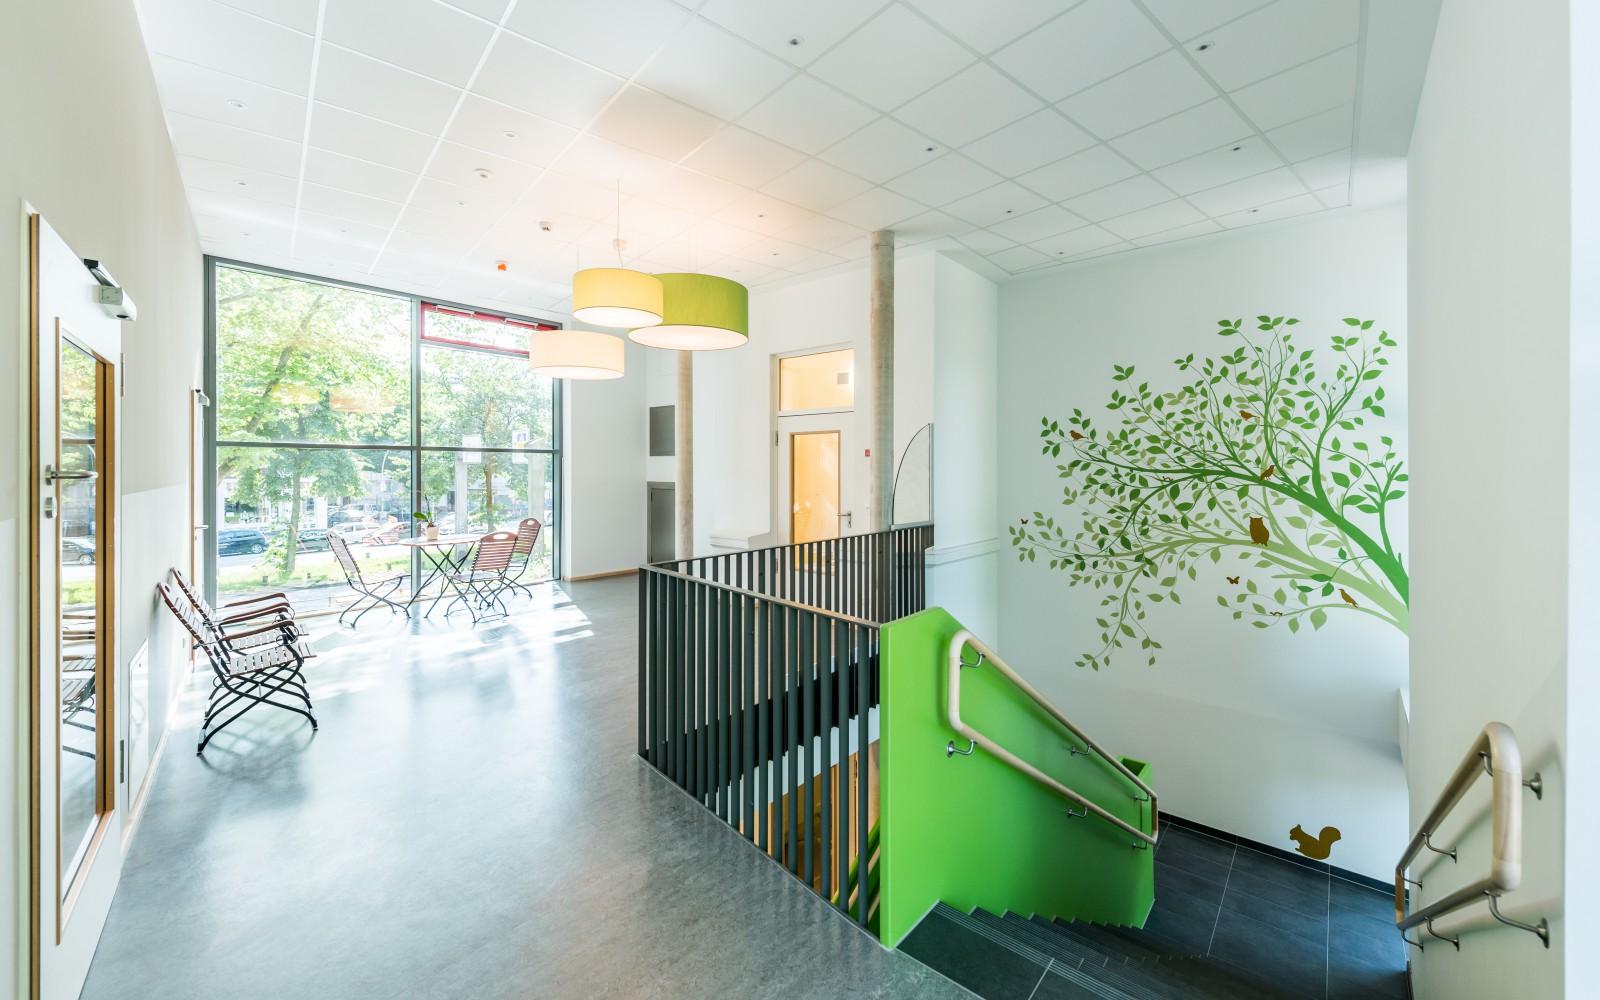 neubau-krippe-kita-ludolfstraße-treppenhaus